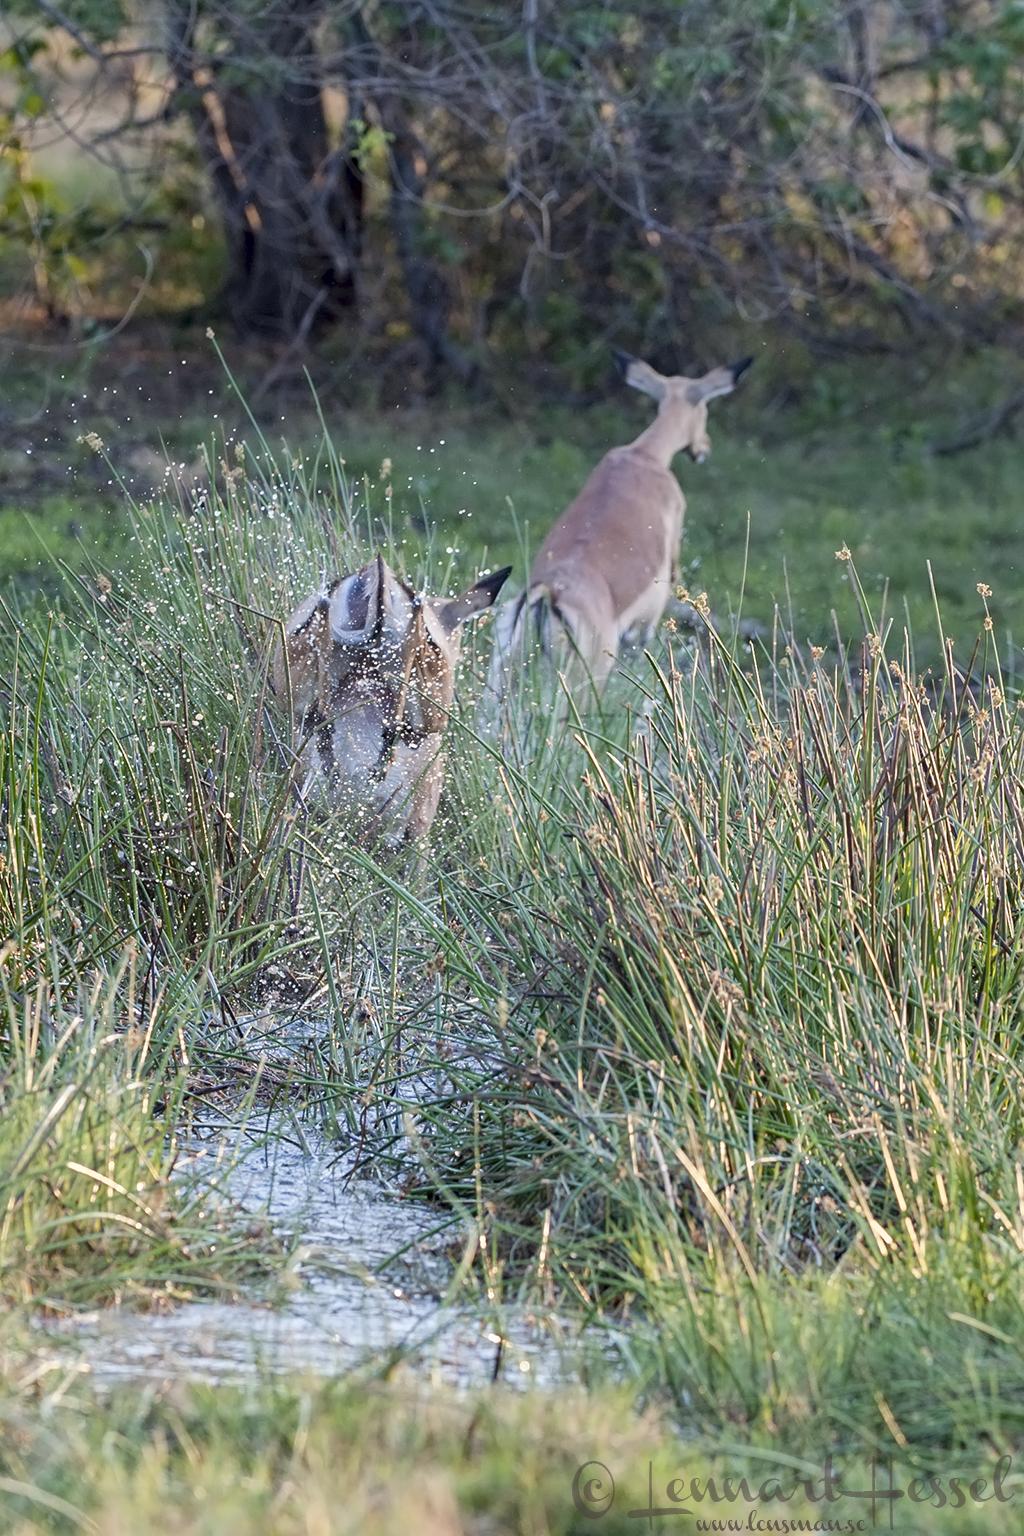 Impalas in Moremi Game Reserve, Botswana